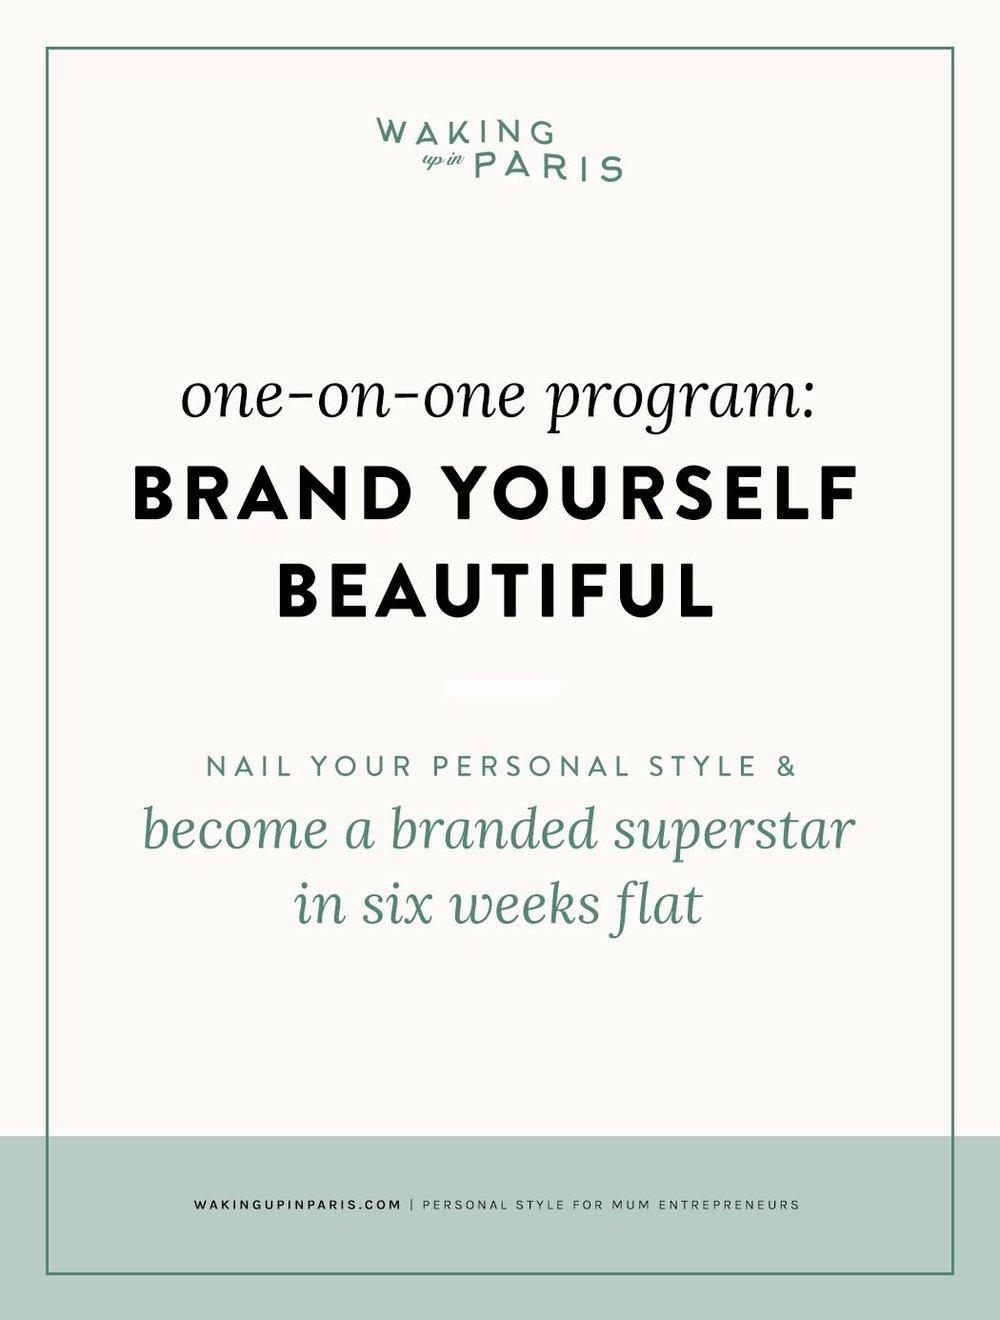 WUIP-clarissa-grace-personal-style-coach-online-mum-entrepreneur-business-brand-yourself-beautiful.jpg